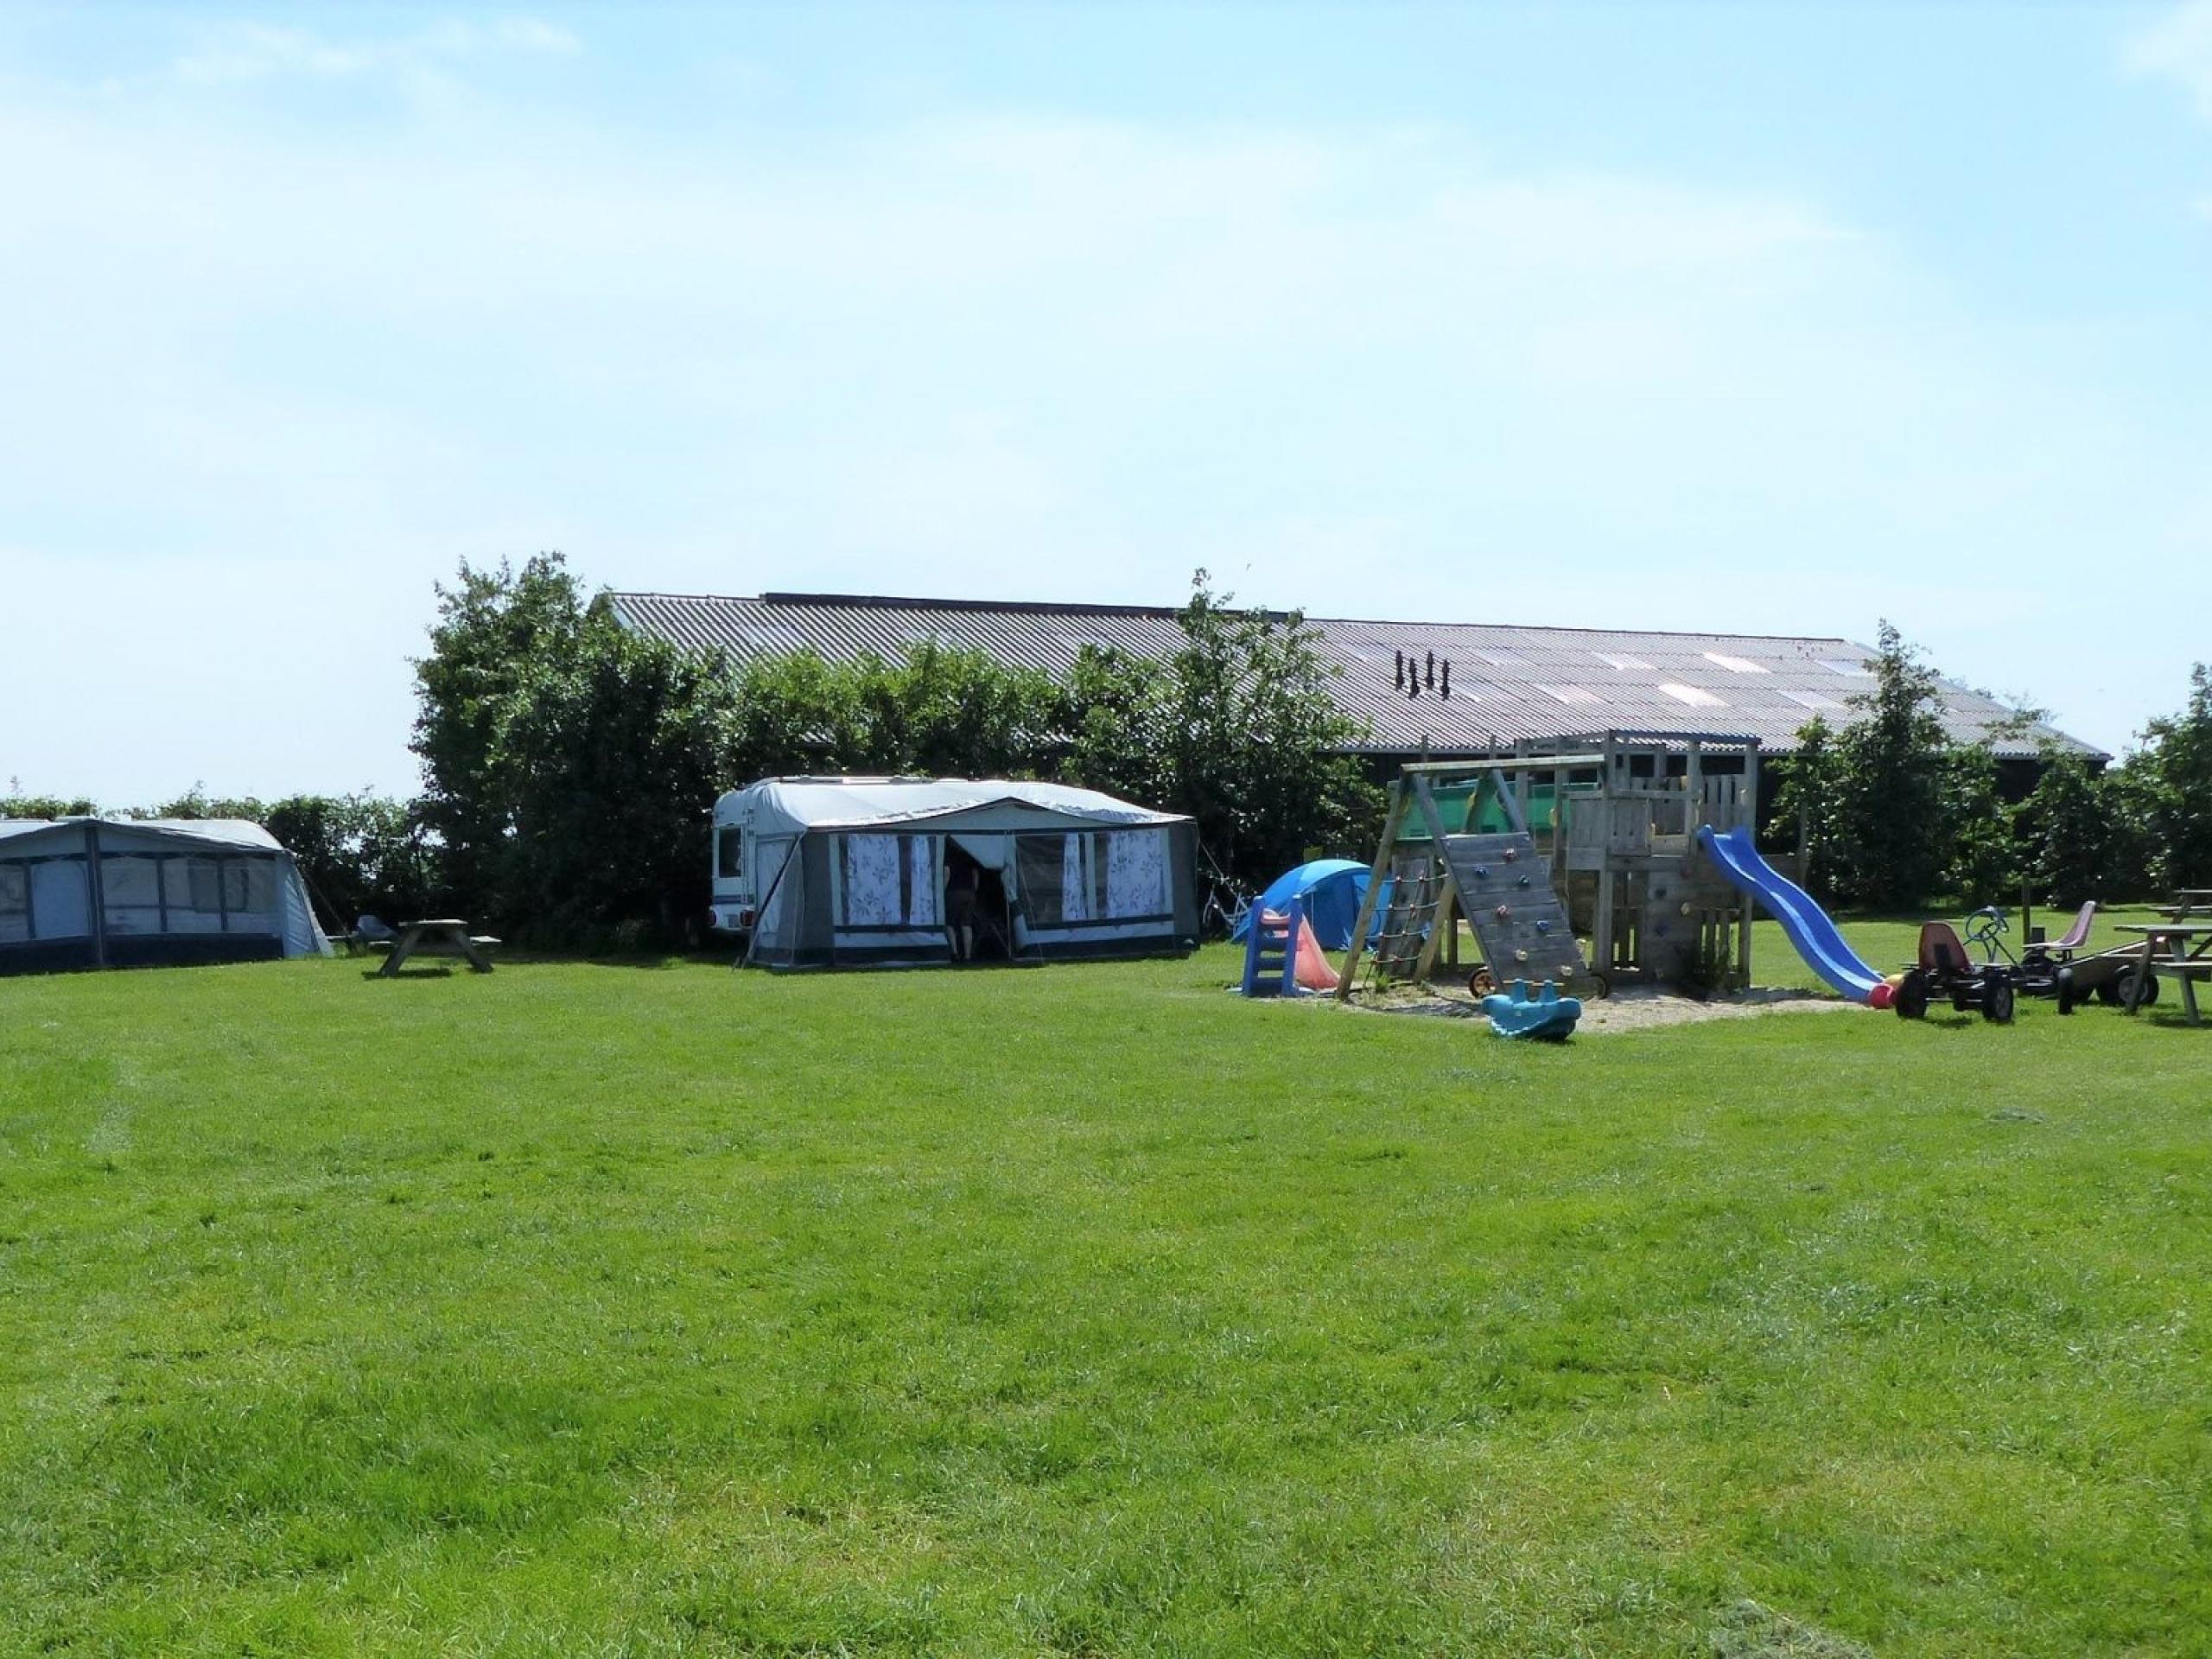 Unwind among the cows and sheep on this campsite near De Koog